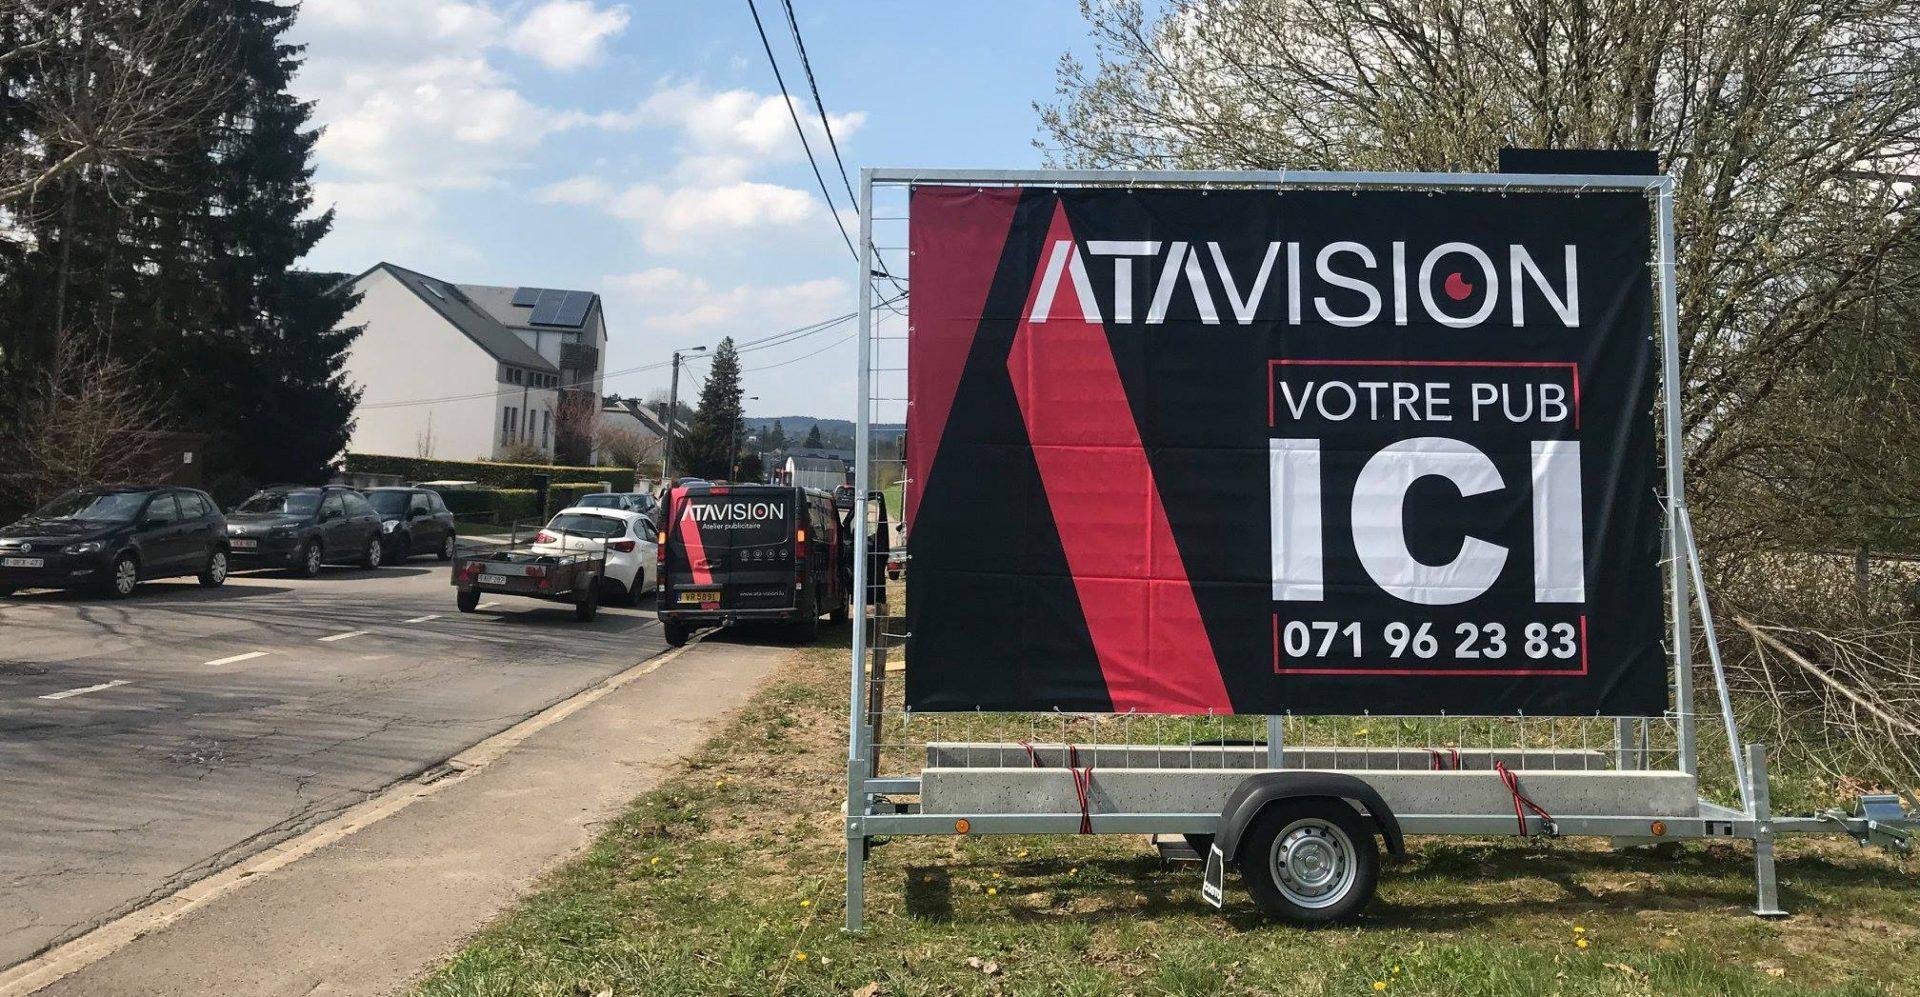 remorque-publicitaire-stationnaire-atavision-luxembourg-belgique